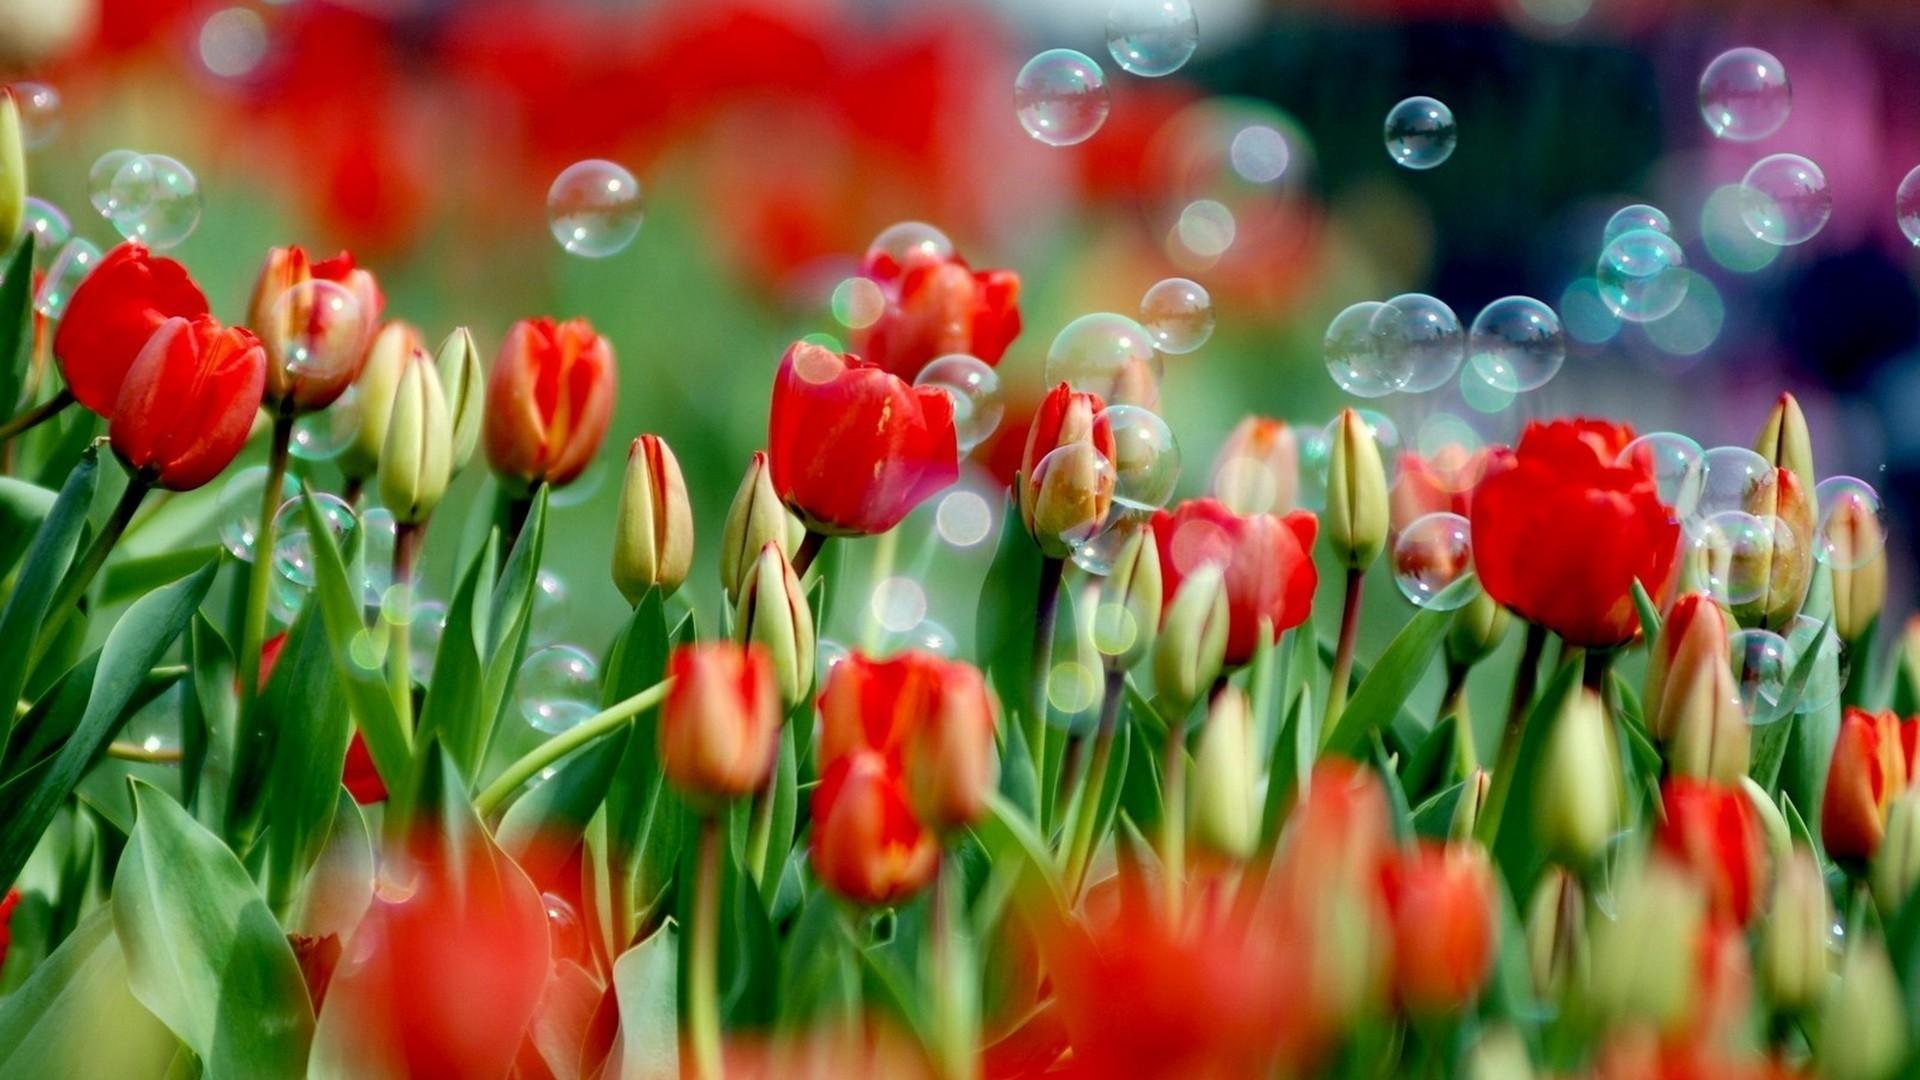 red tulip flower wallpaper nature hd